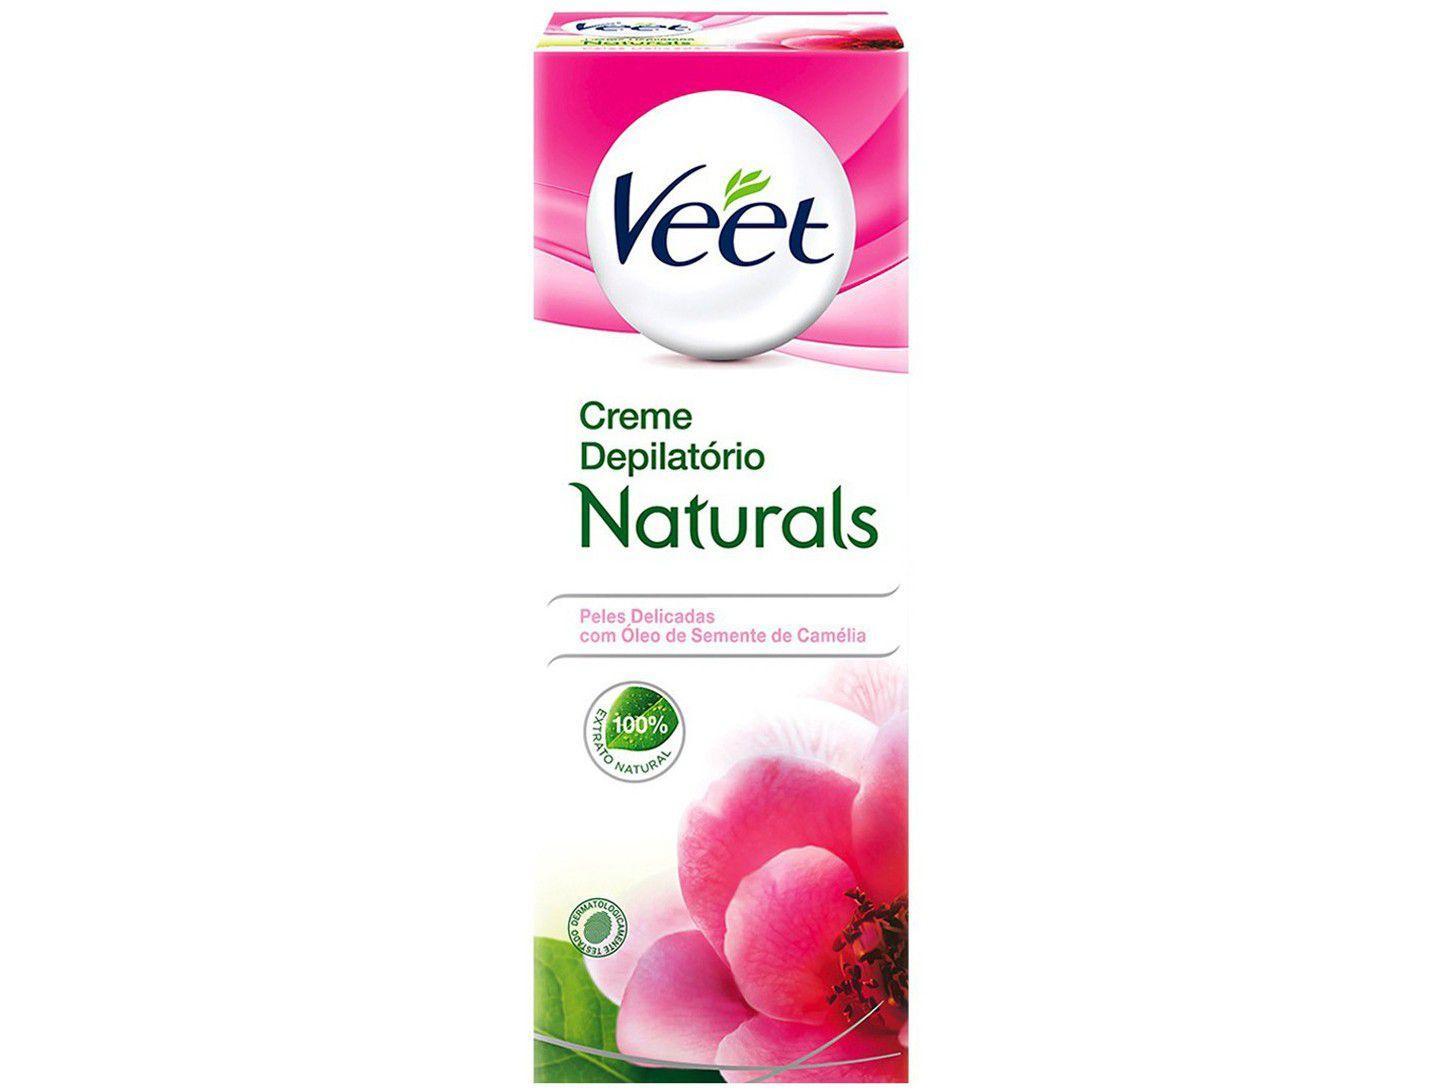 Creme Depilatório Veet Peles Delicadas Camélia - Naturals Corporal Feminina 100ml